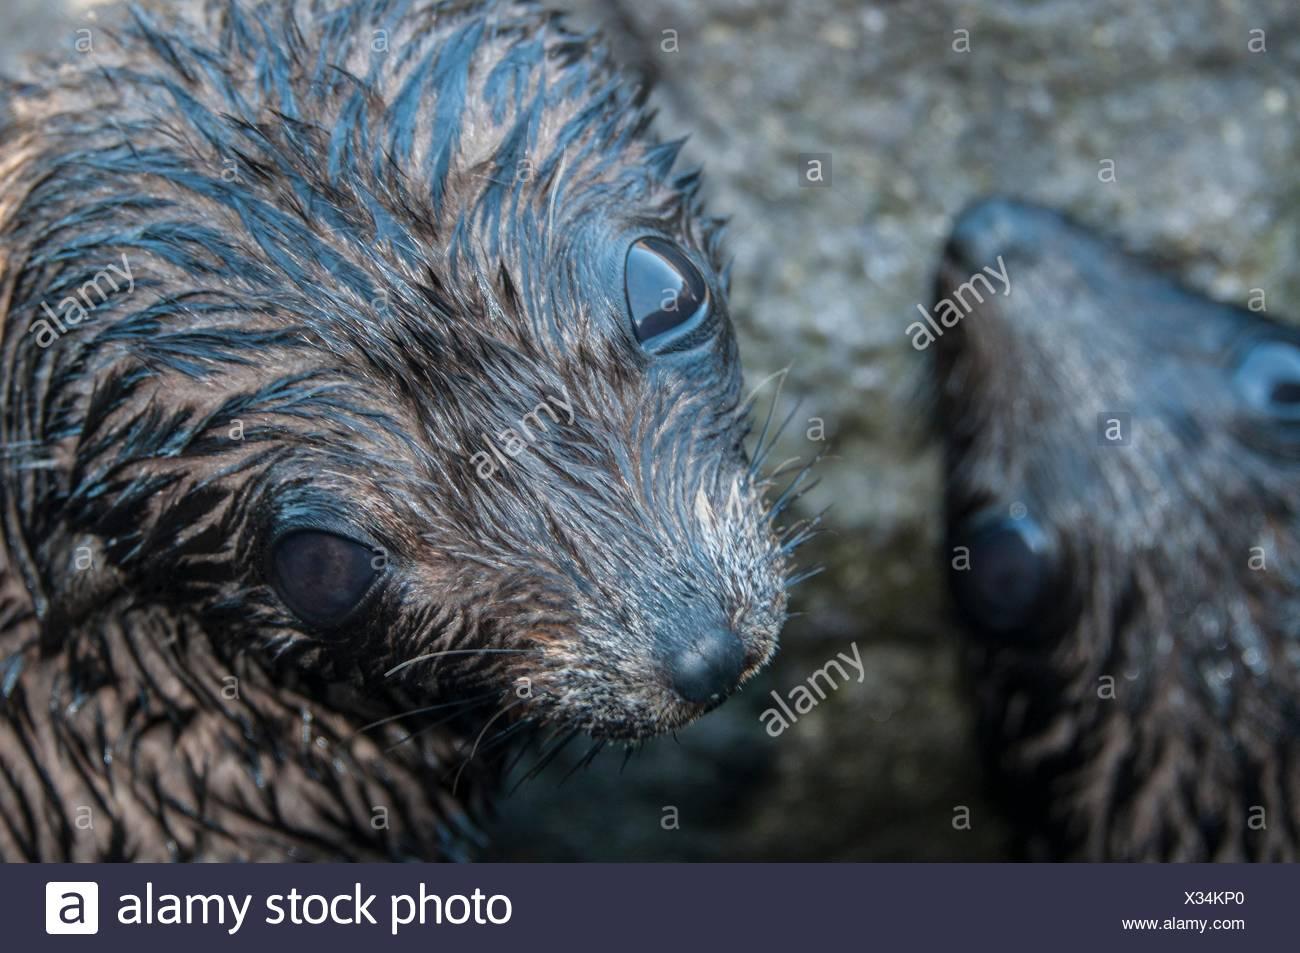 Sobrecarga de cerca de Guadalupe de crías de focas peleteras ;mirando hacia la cámara, Isla Guadalupe, Baja California, México Imagen De Stock